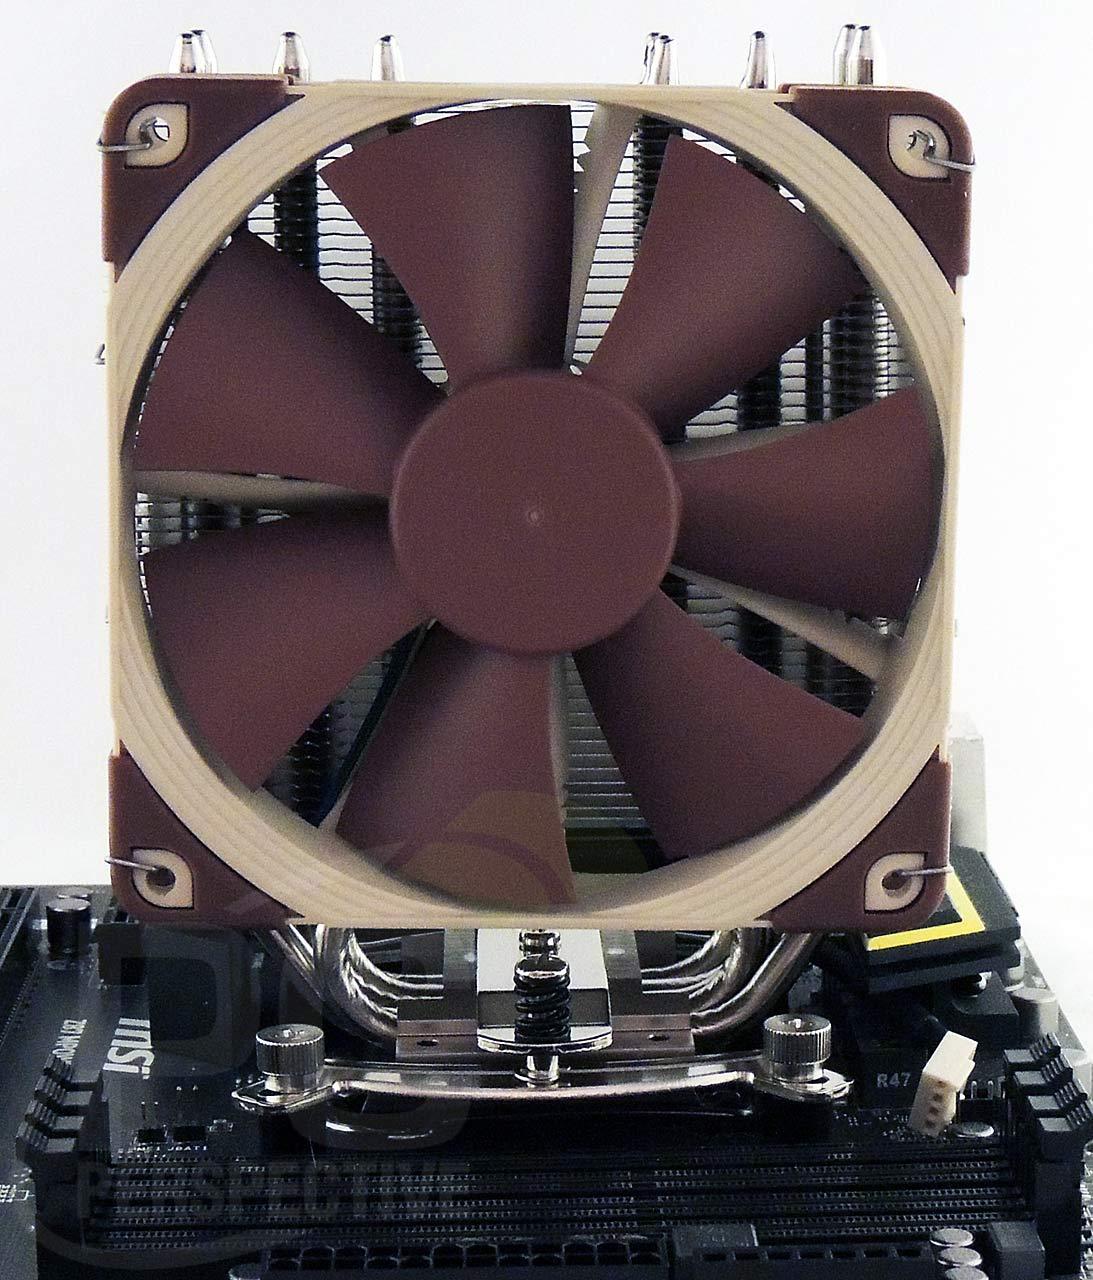 11-board-cooler-front-noram.jpg